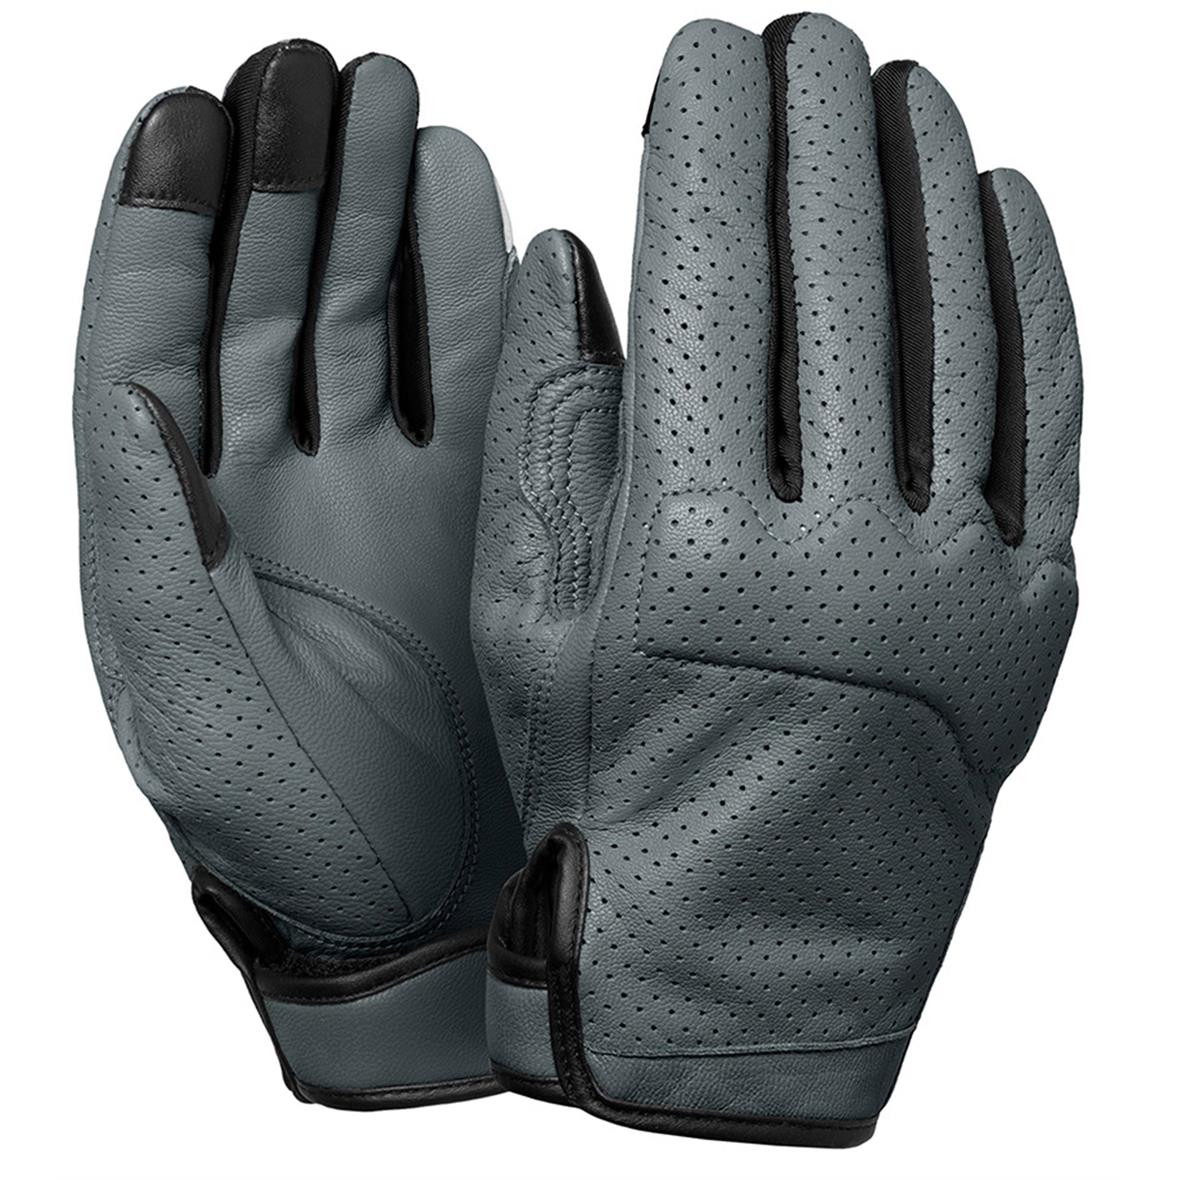 Product Image for 'Gloves TUCANO URBANO New Shorty size XLTitle'